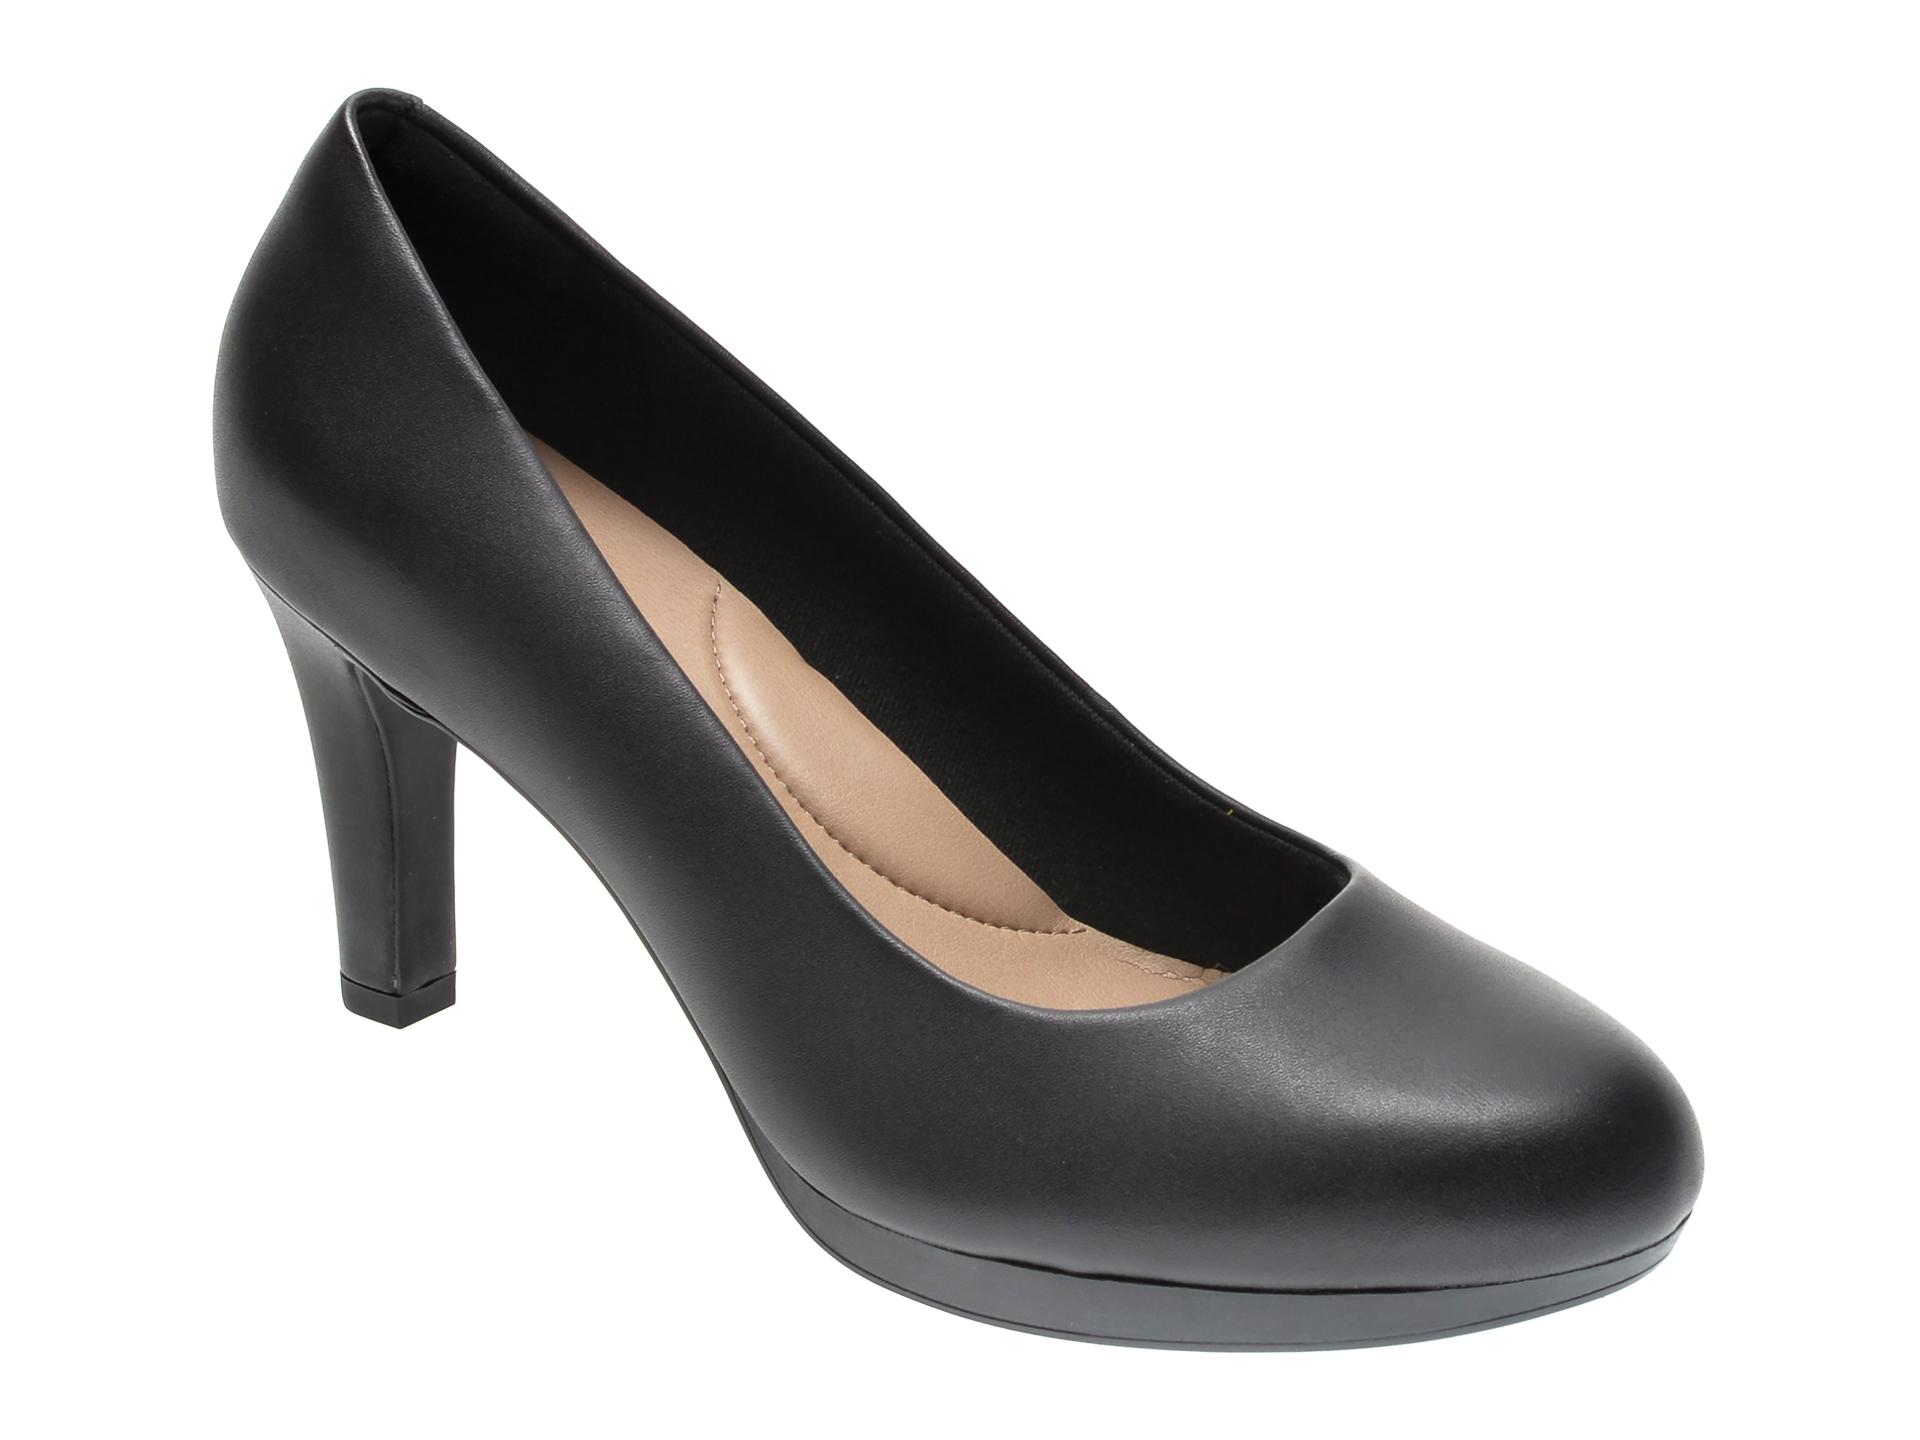 Pantofi CLARKS negri, ADRIEL VIOLA, din piele naturala imagine